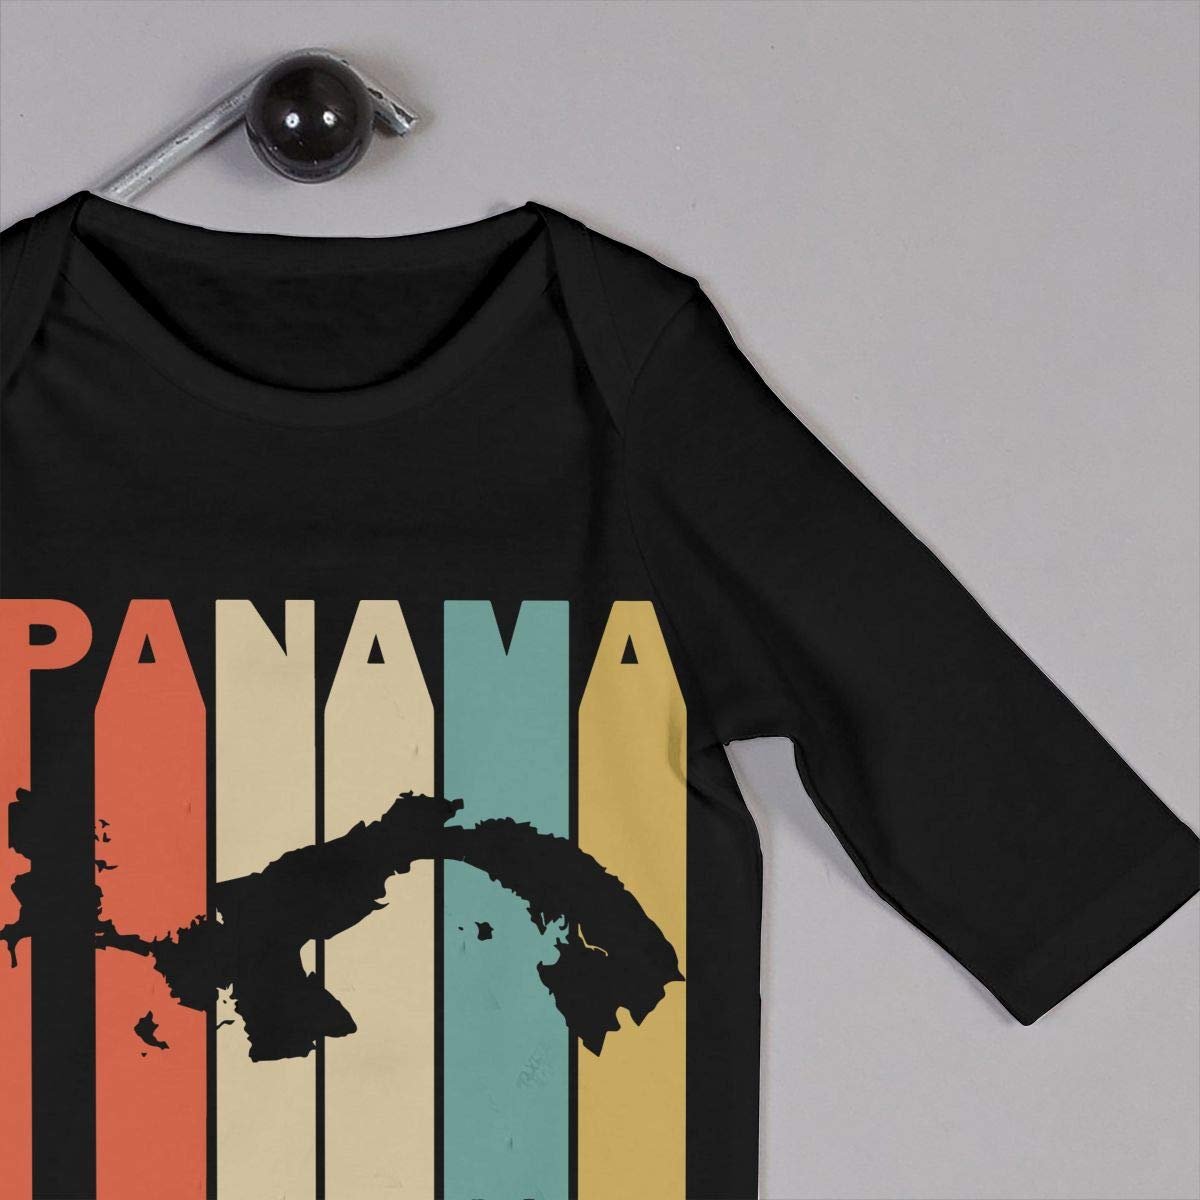 Long Sleeve Cotton Bodysuit for Baby Girls Boys Fashion Retro Style Panama Silhouette Onesies